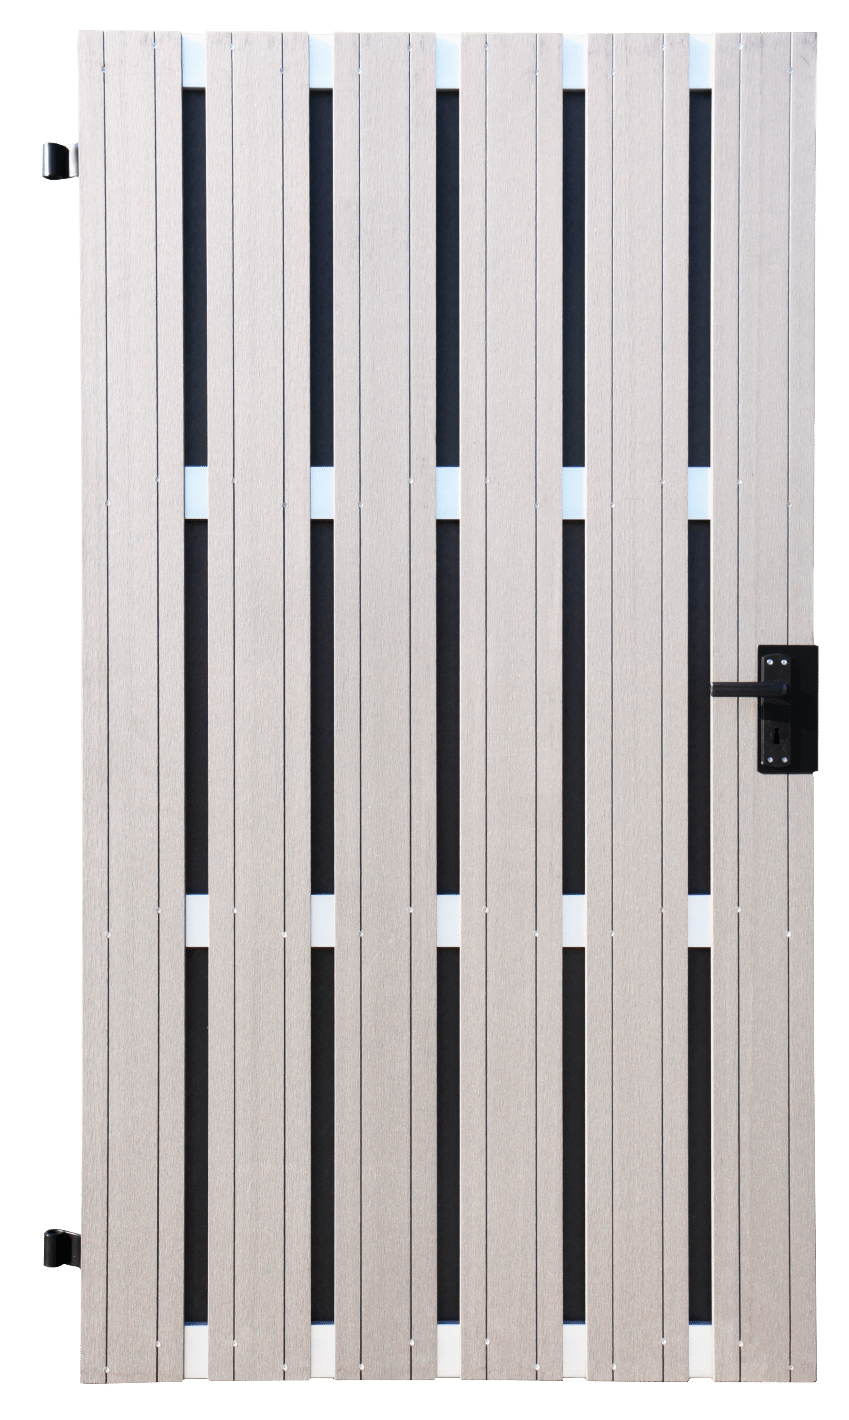 Sichtschutz tor groja solid bpc din rechts 108 x 180 cm bi color weiß